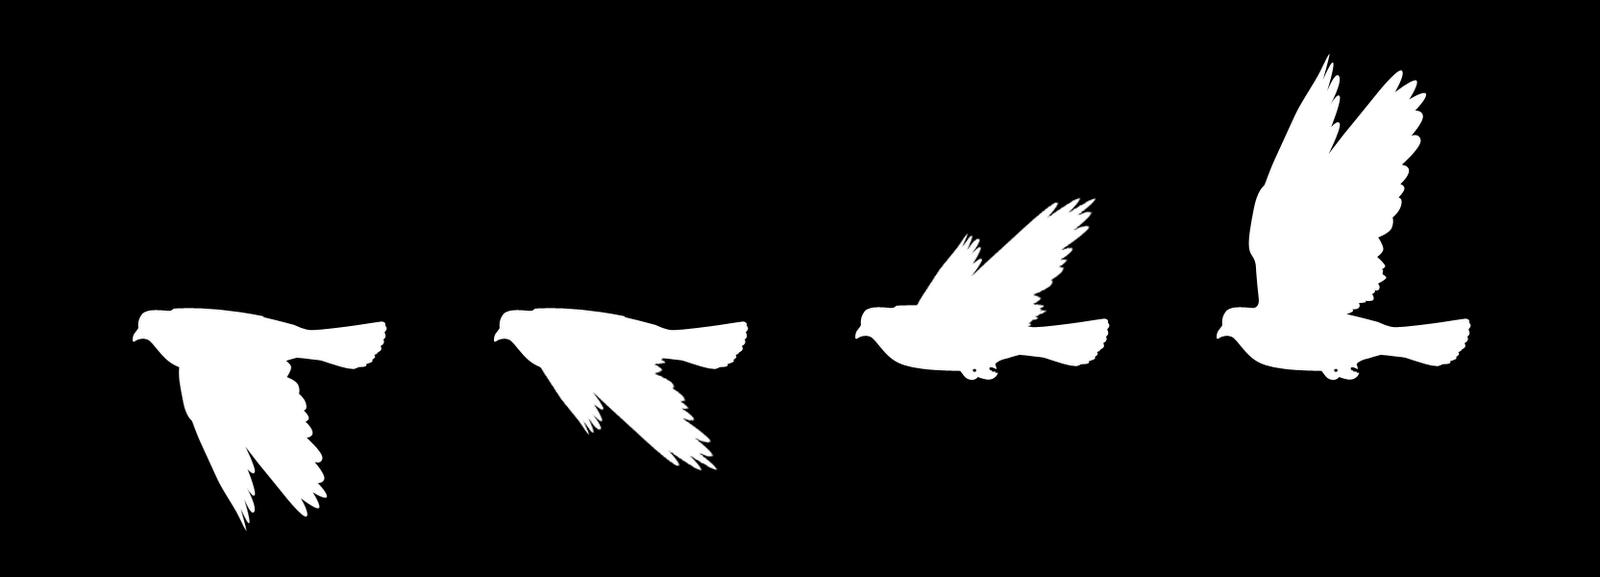 banner royalty free download Vector books flying. Simple bird vectors google